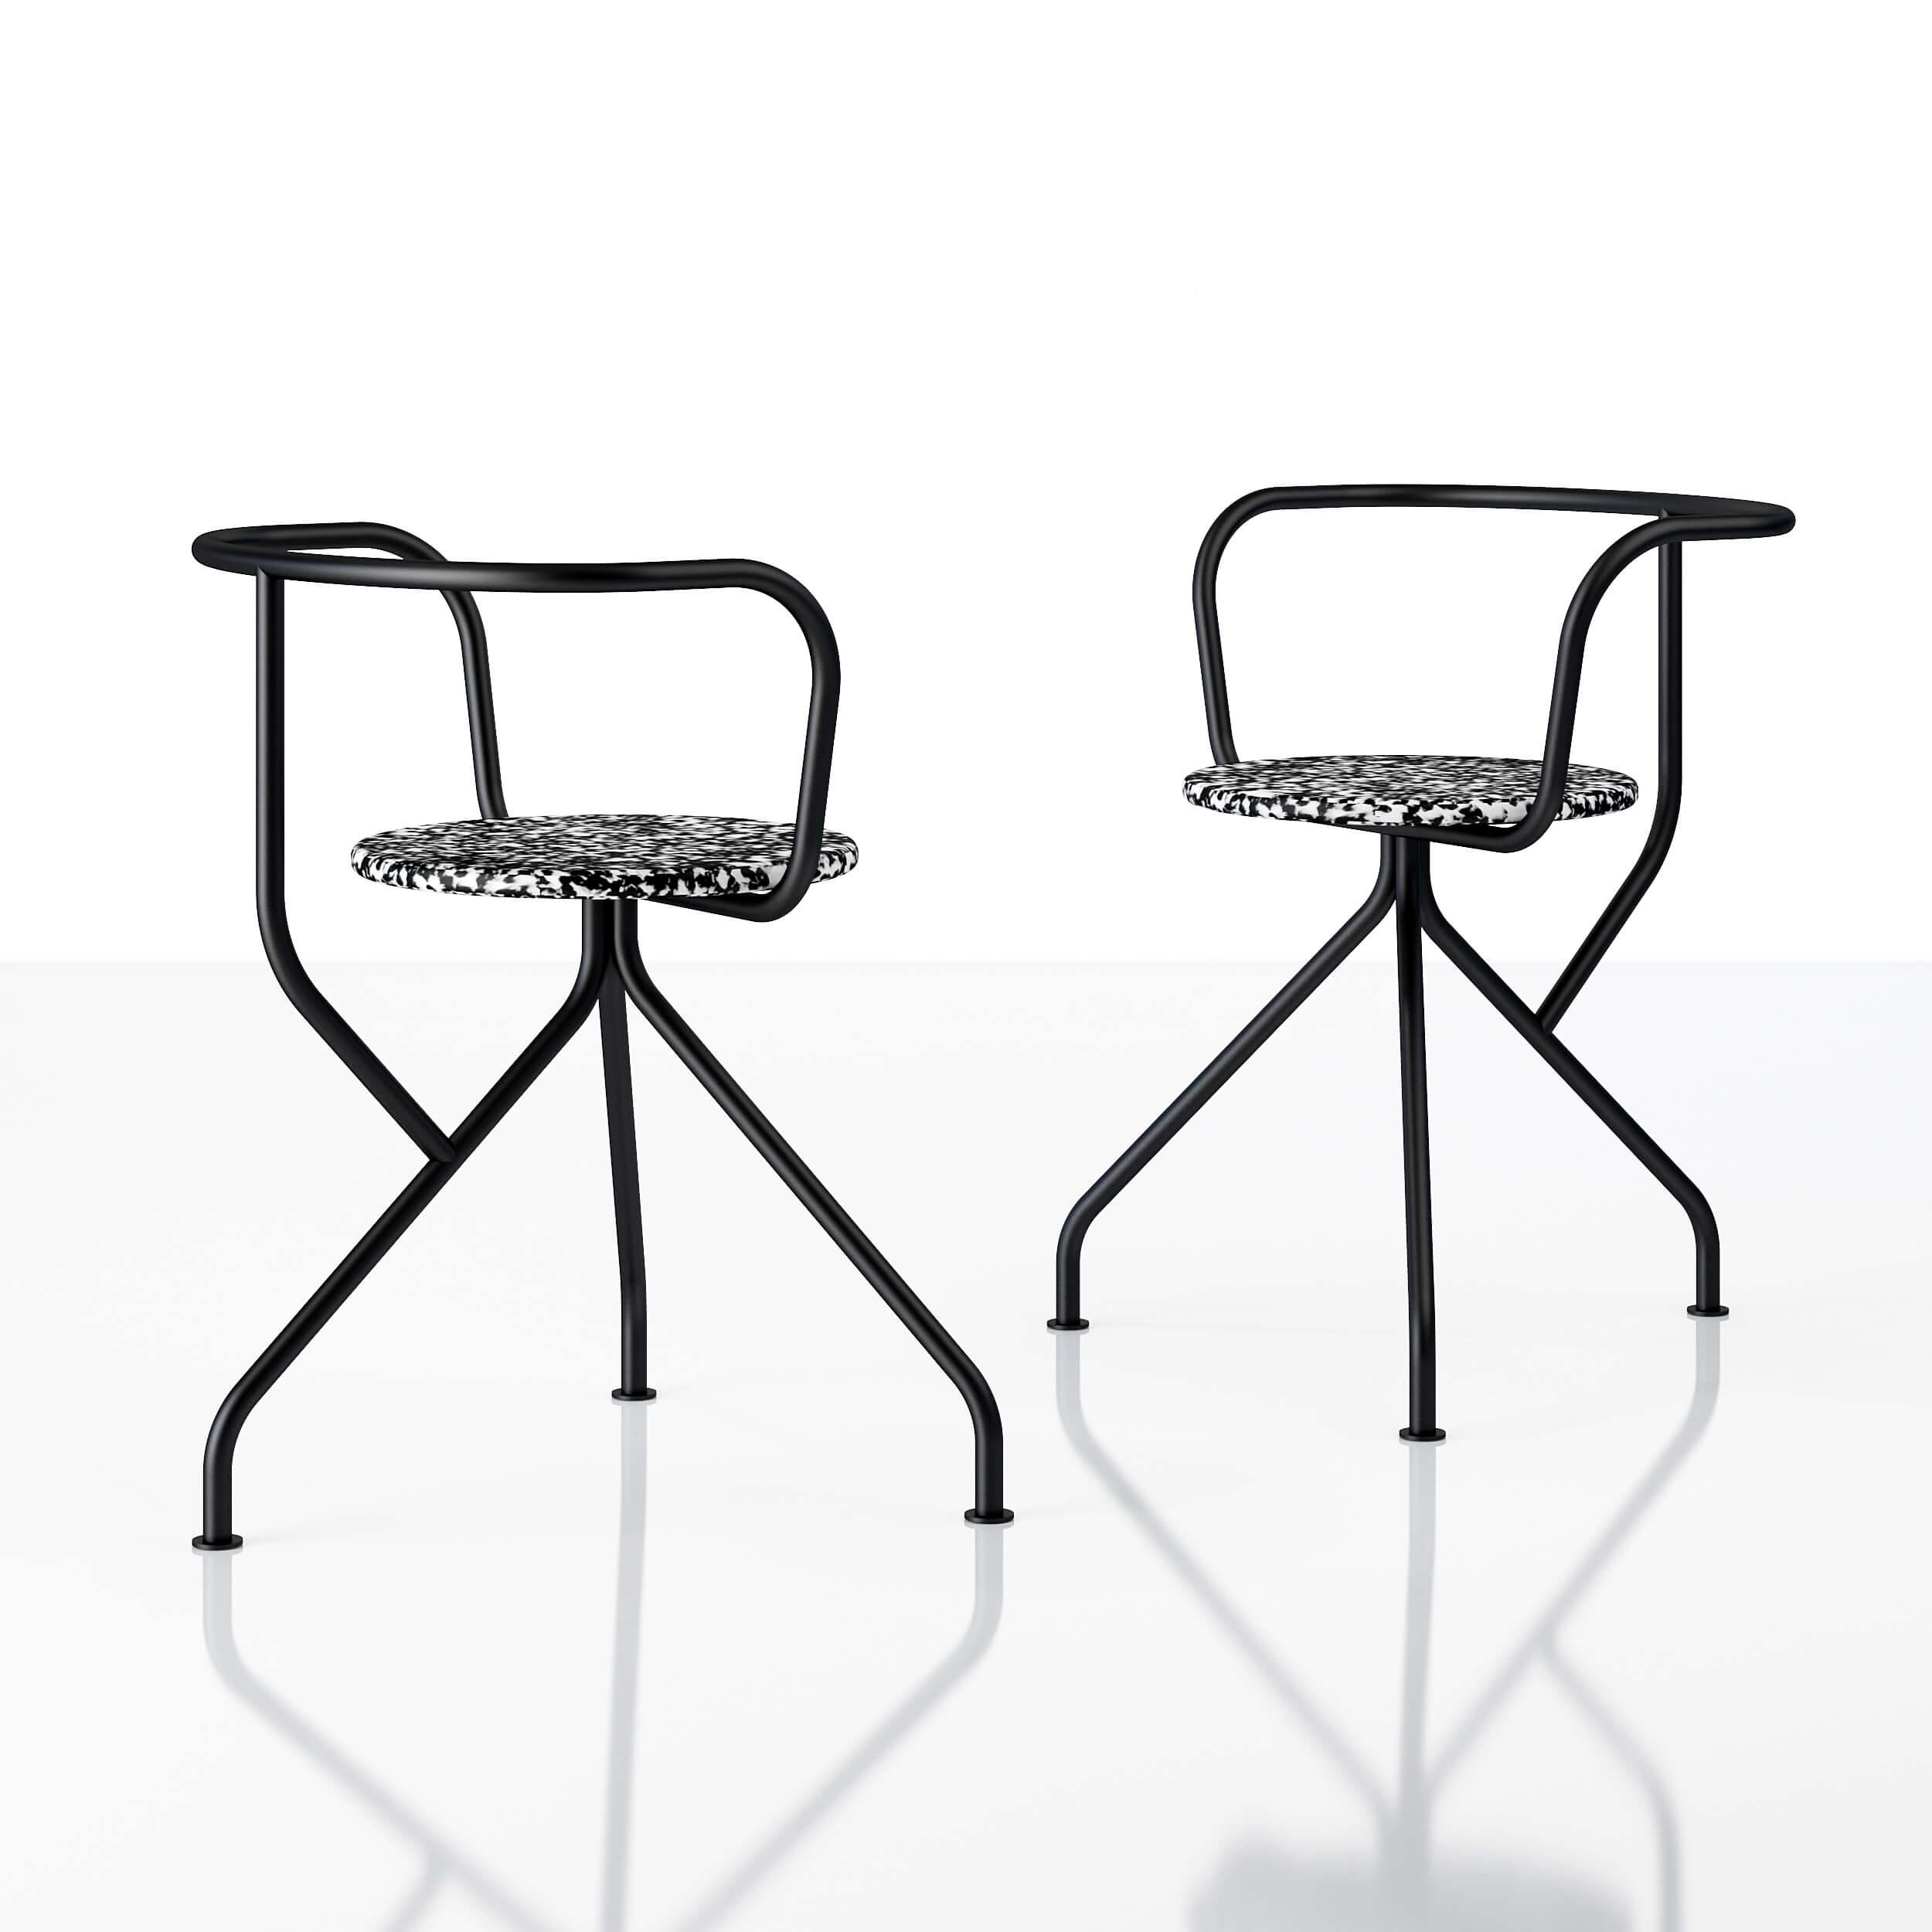 Recycled chair Kohti